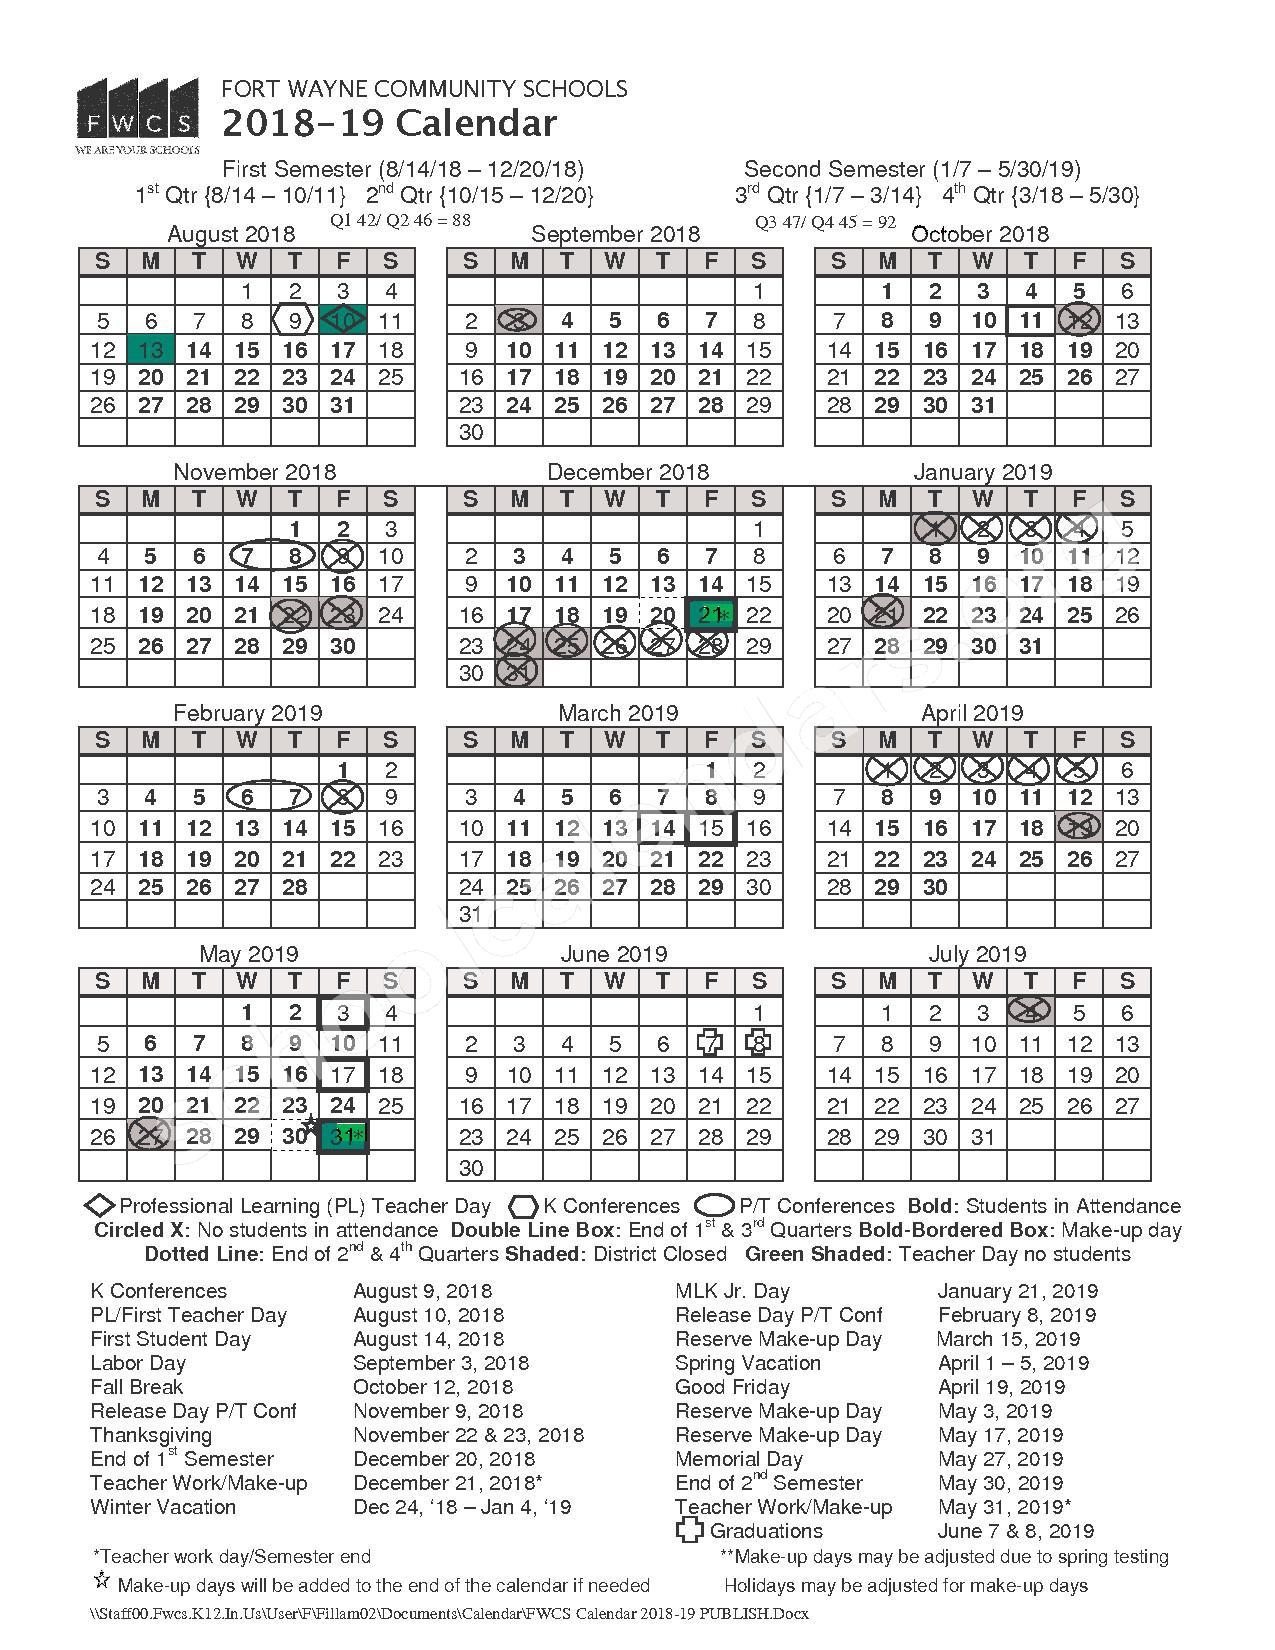 2018 - 2019 School Calendar – Fort Wayne Community Schools – page 1